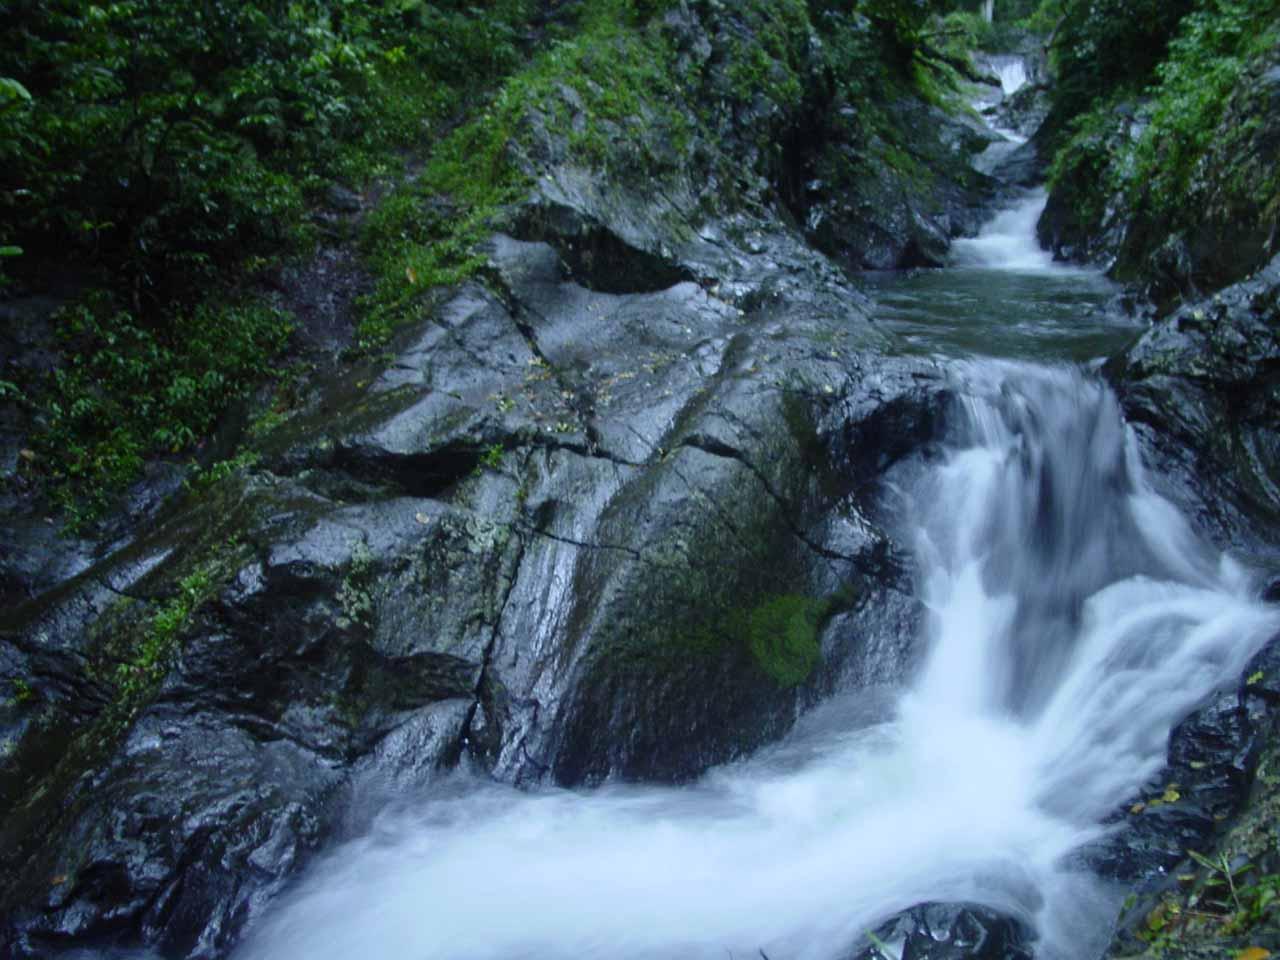 The Waitavala Water Slide